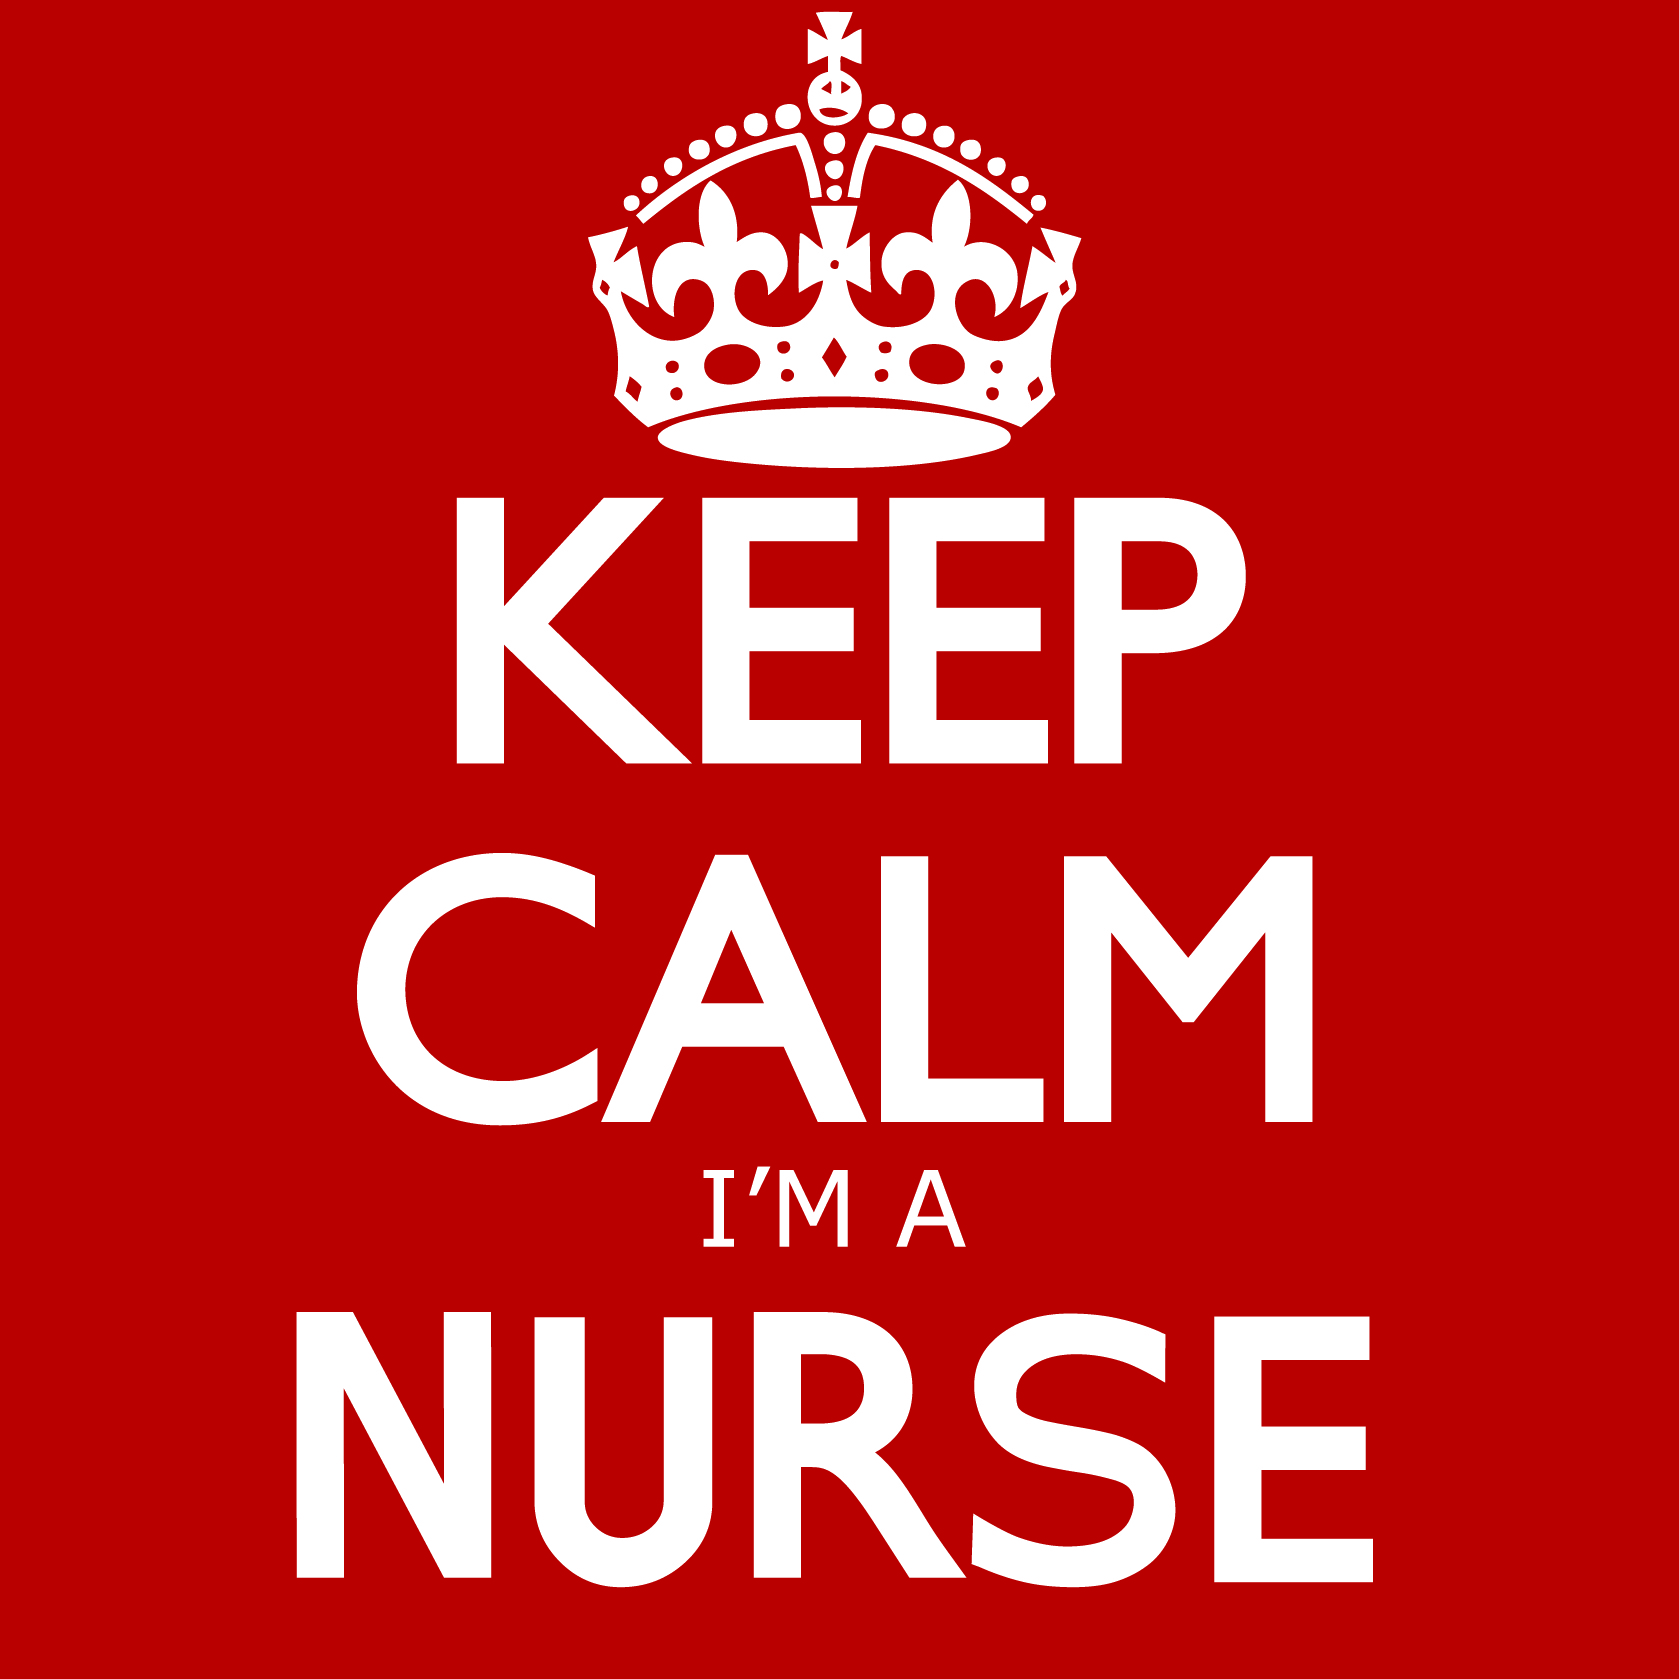 Happy nurses week free clipart clipart library download Happy Nurses Week Clip Art free image clipart library download